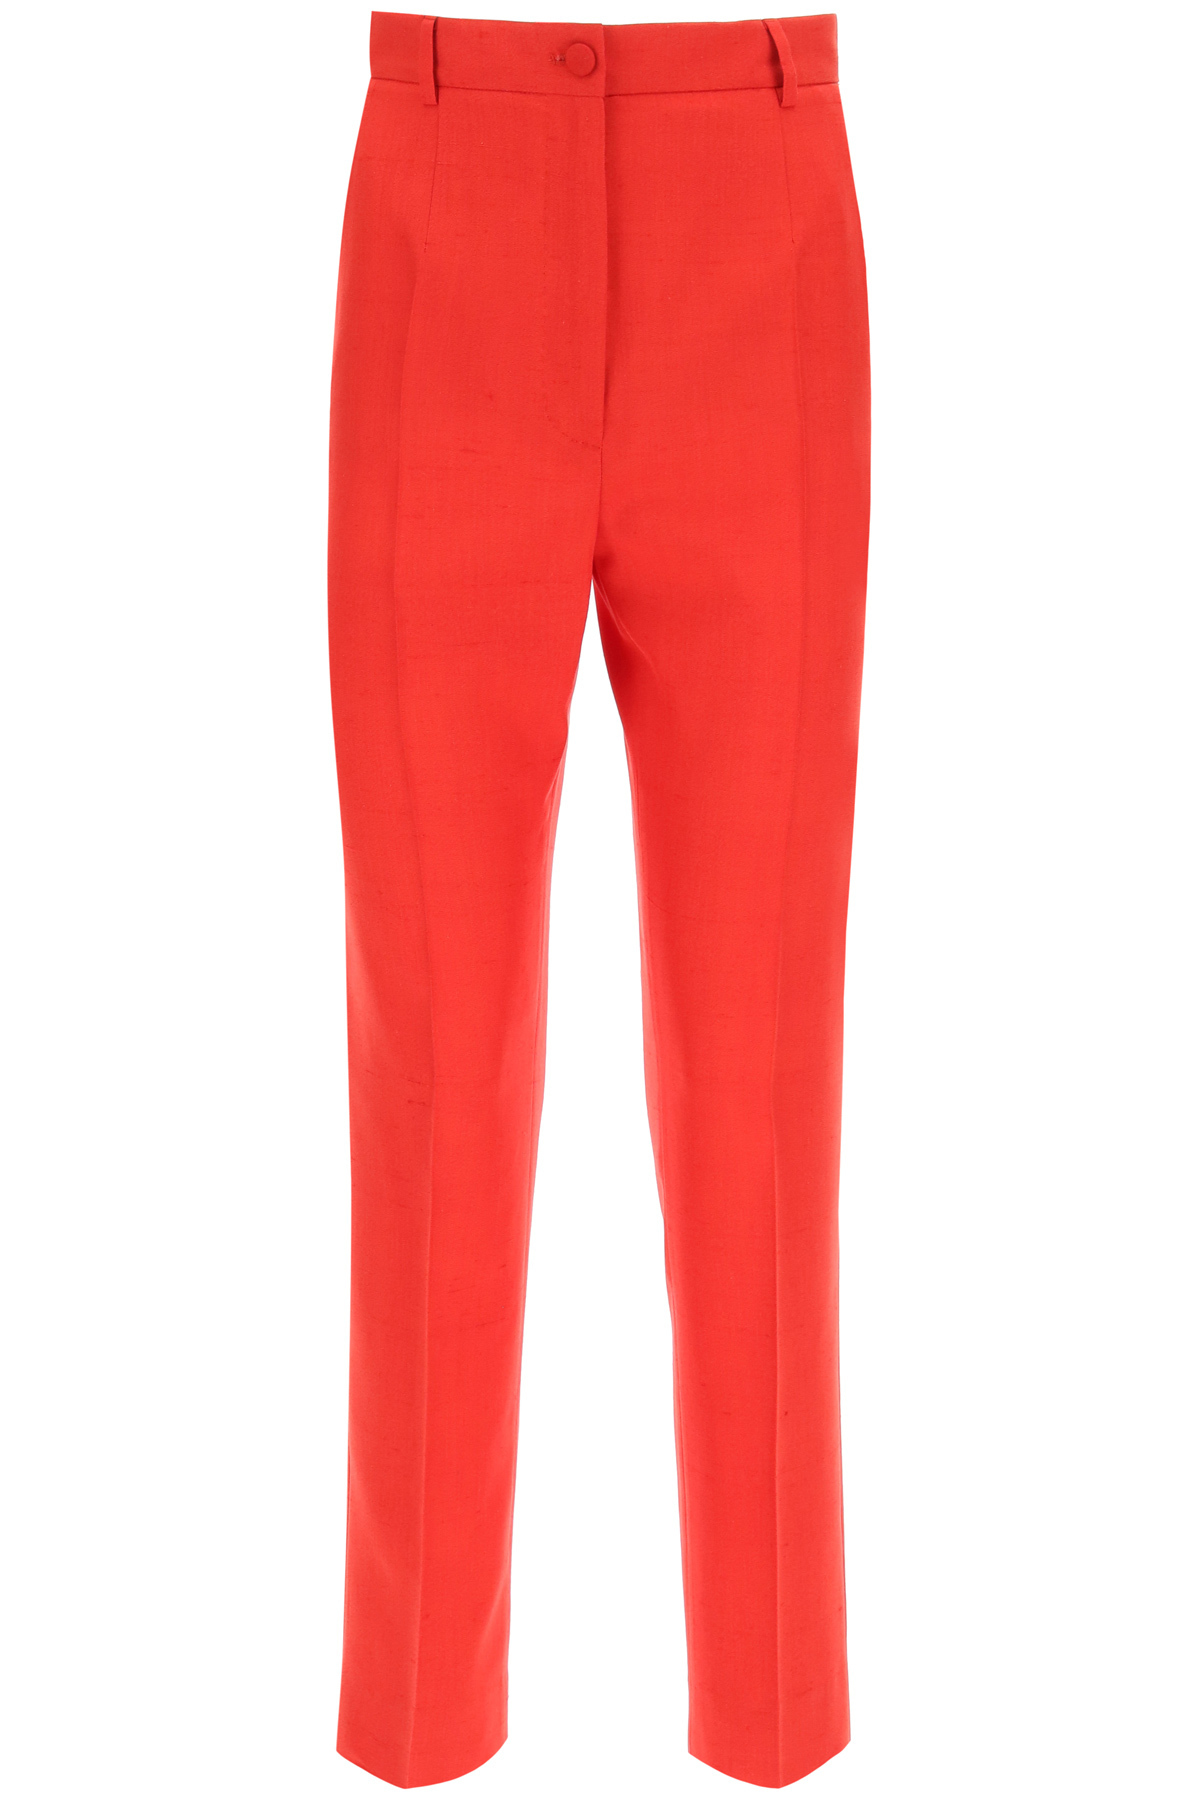 Dolce & gabbana pantaloni in tela schappe